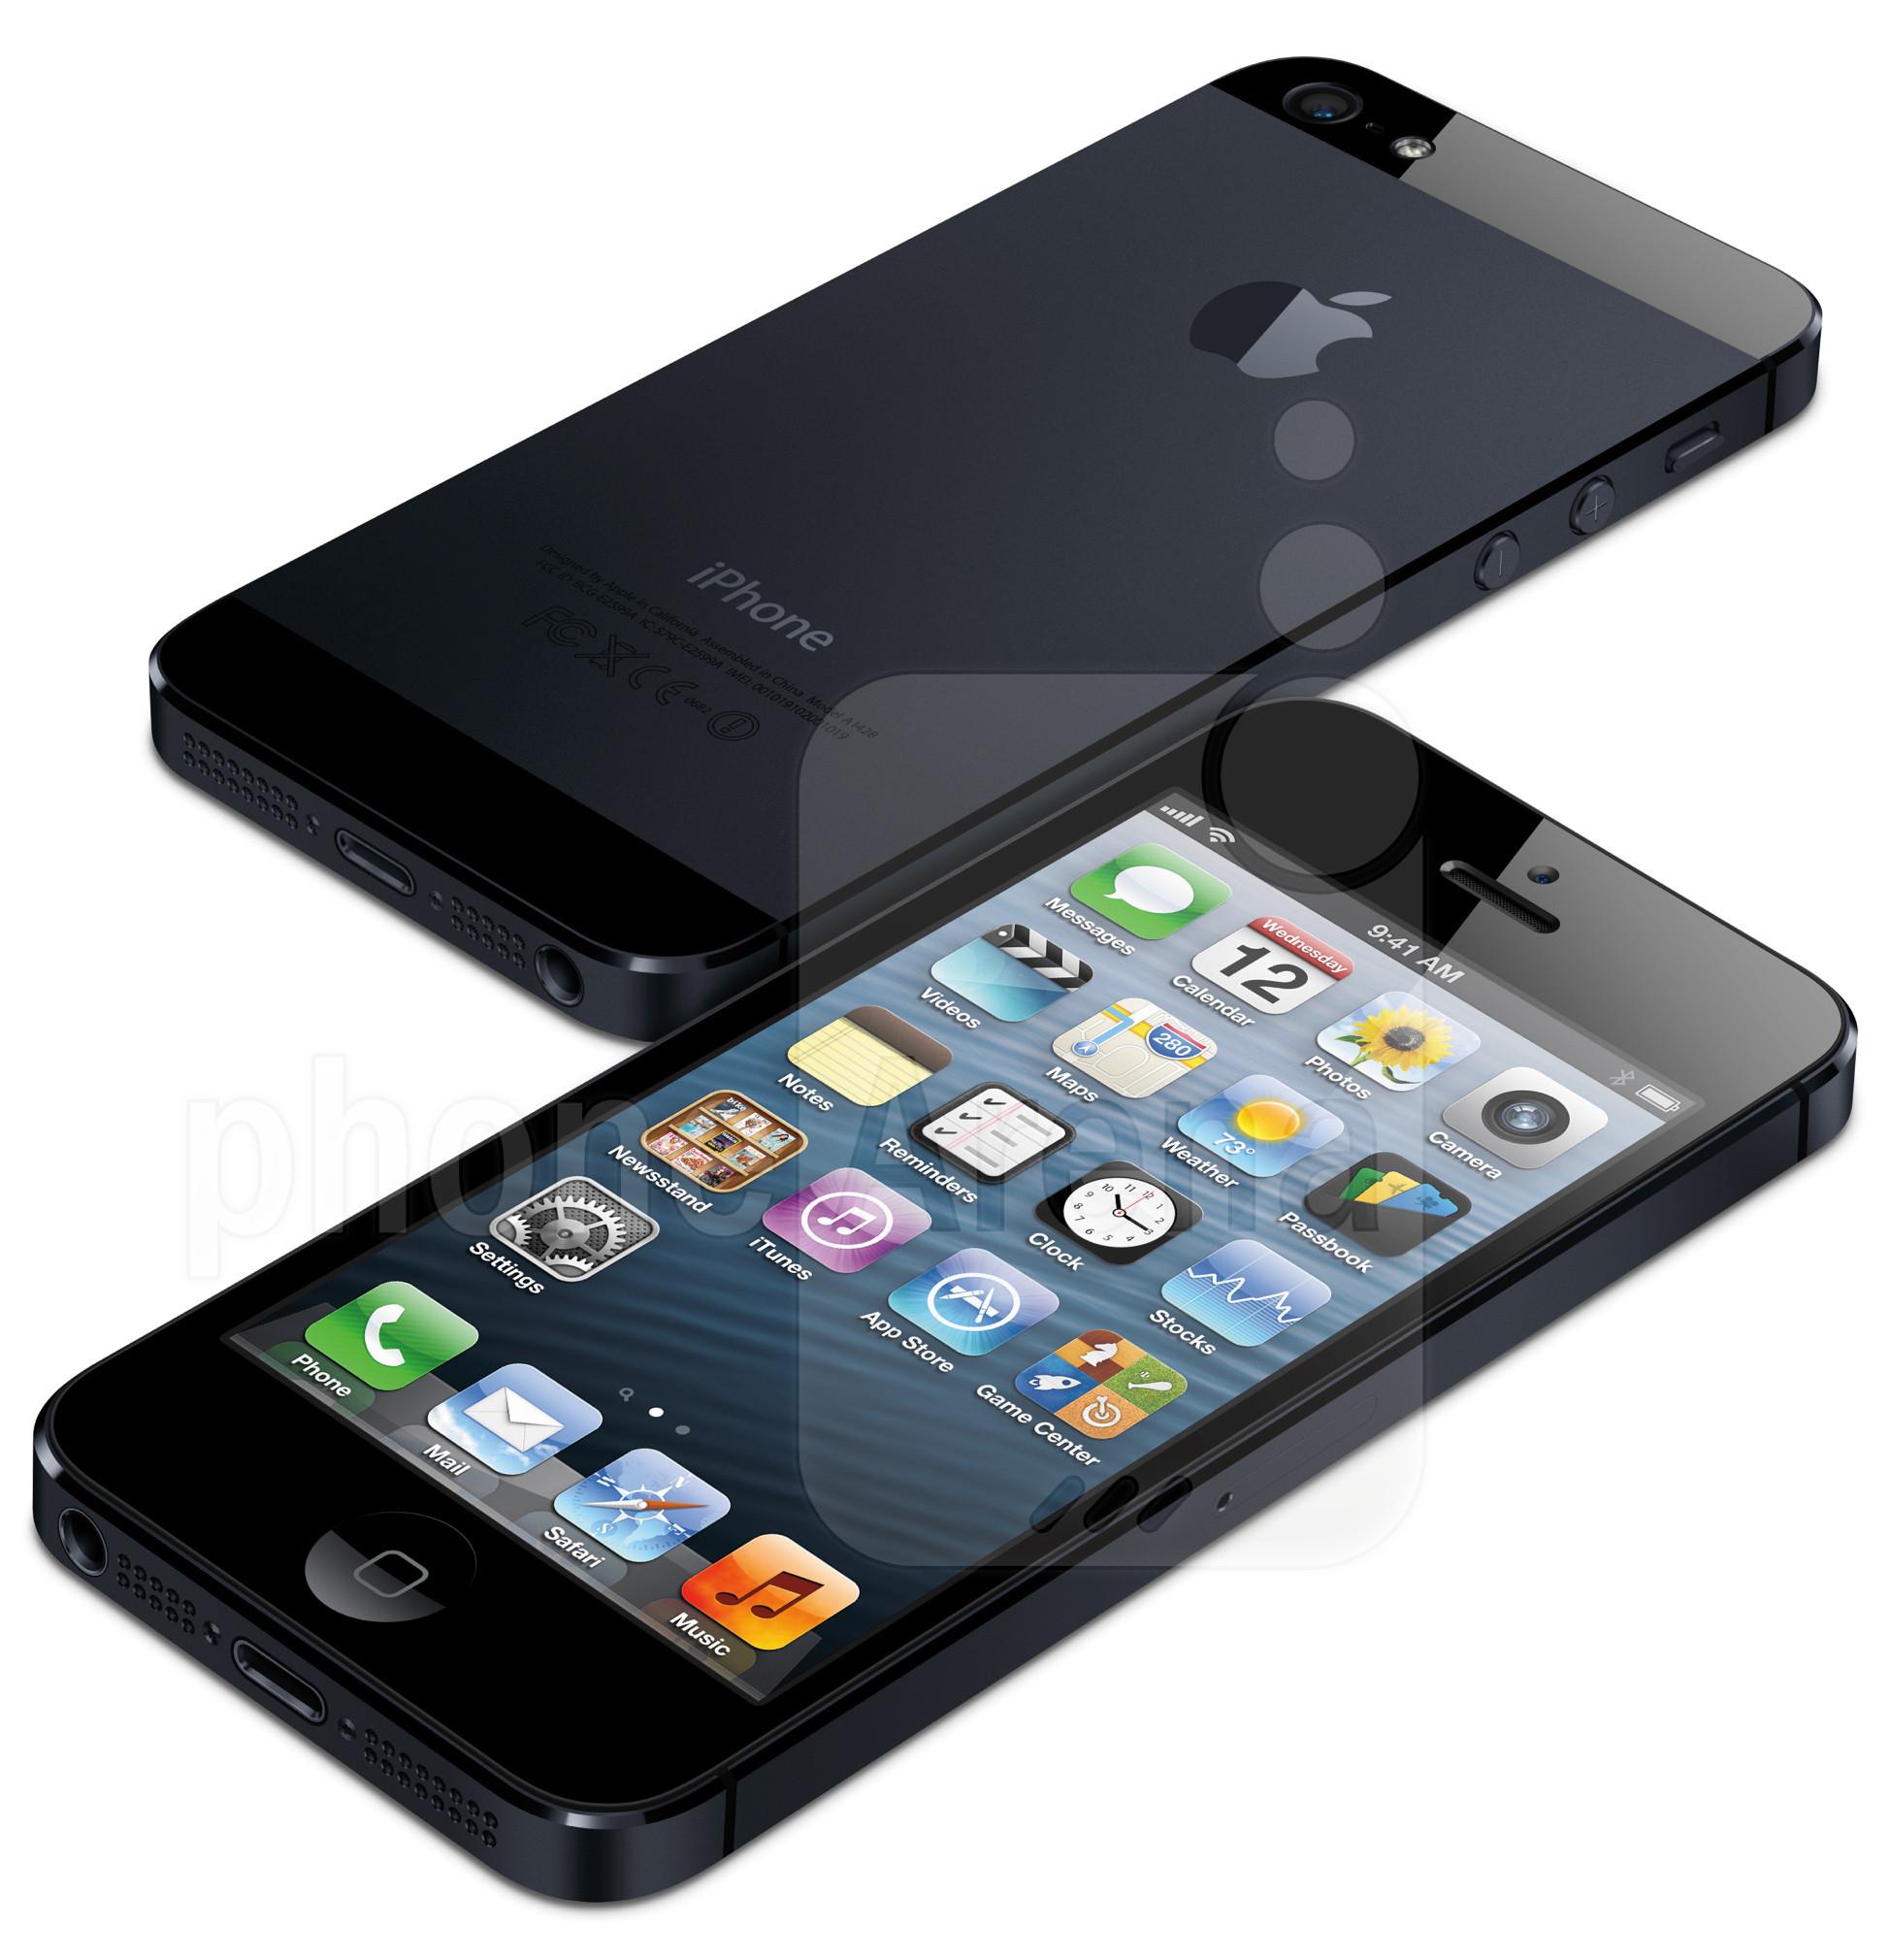 Apple-iPhone-5-3ad.jpg